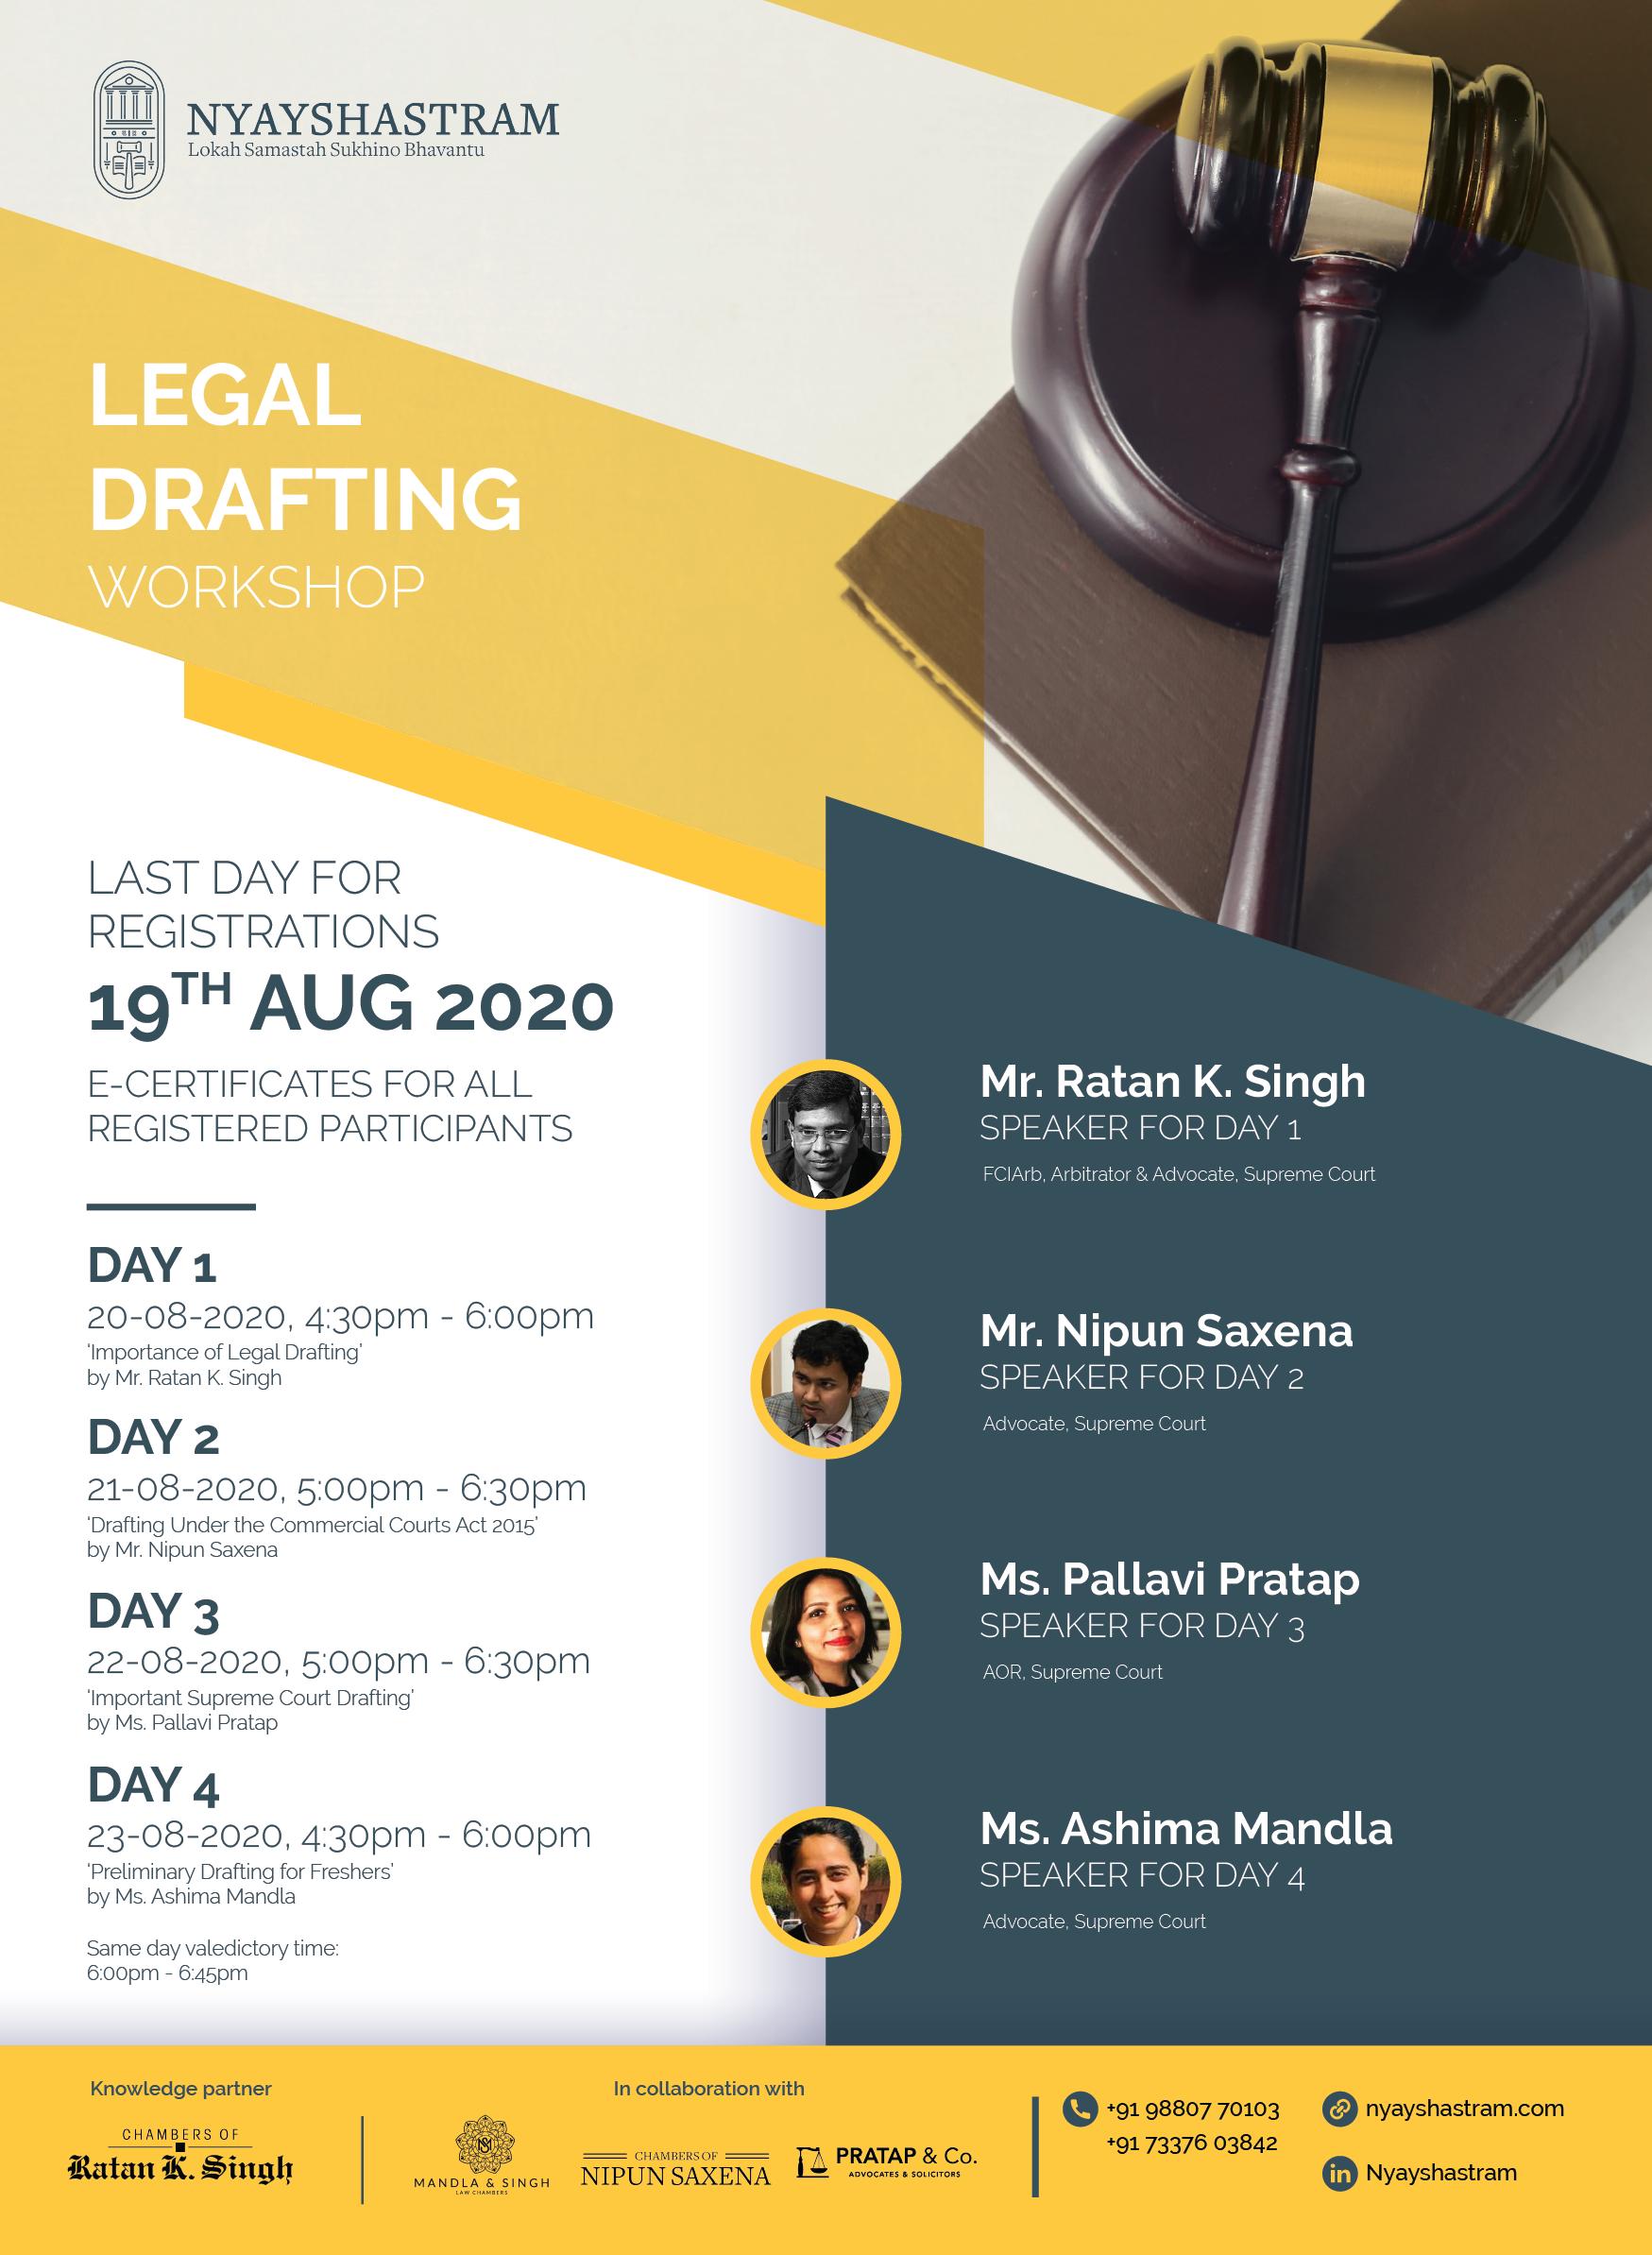 Nyayshastram's Workshop on Legal Drafting